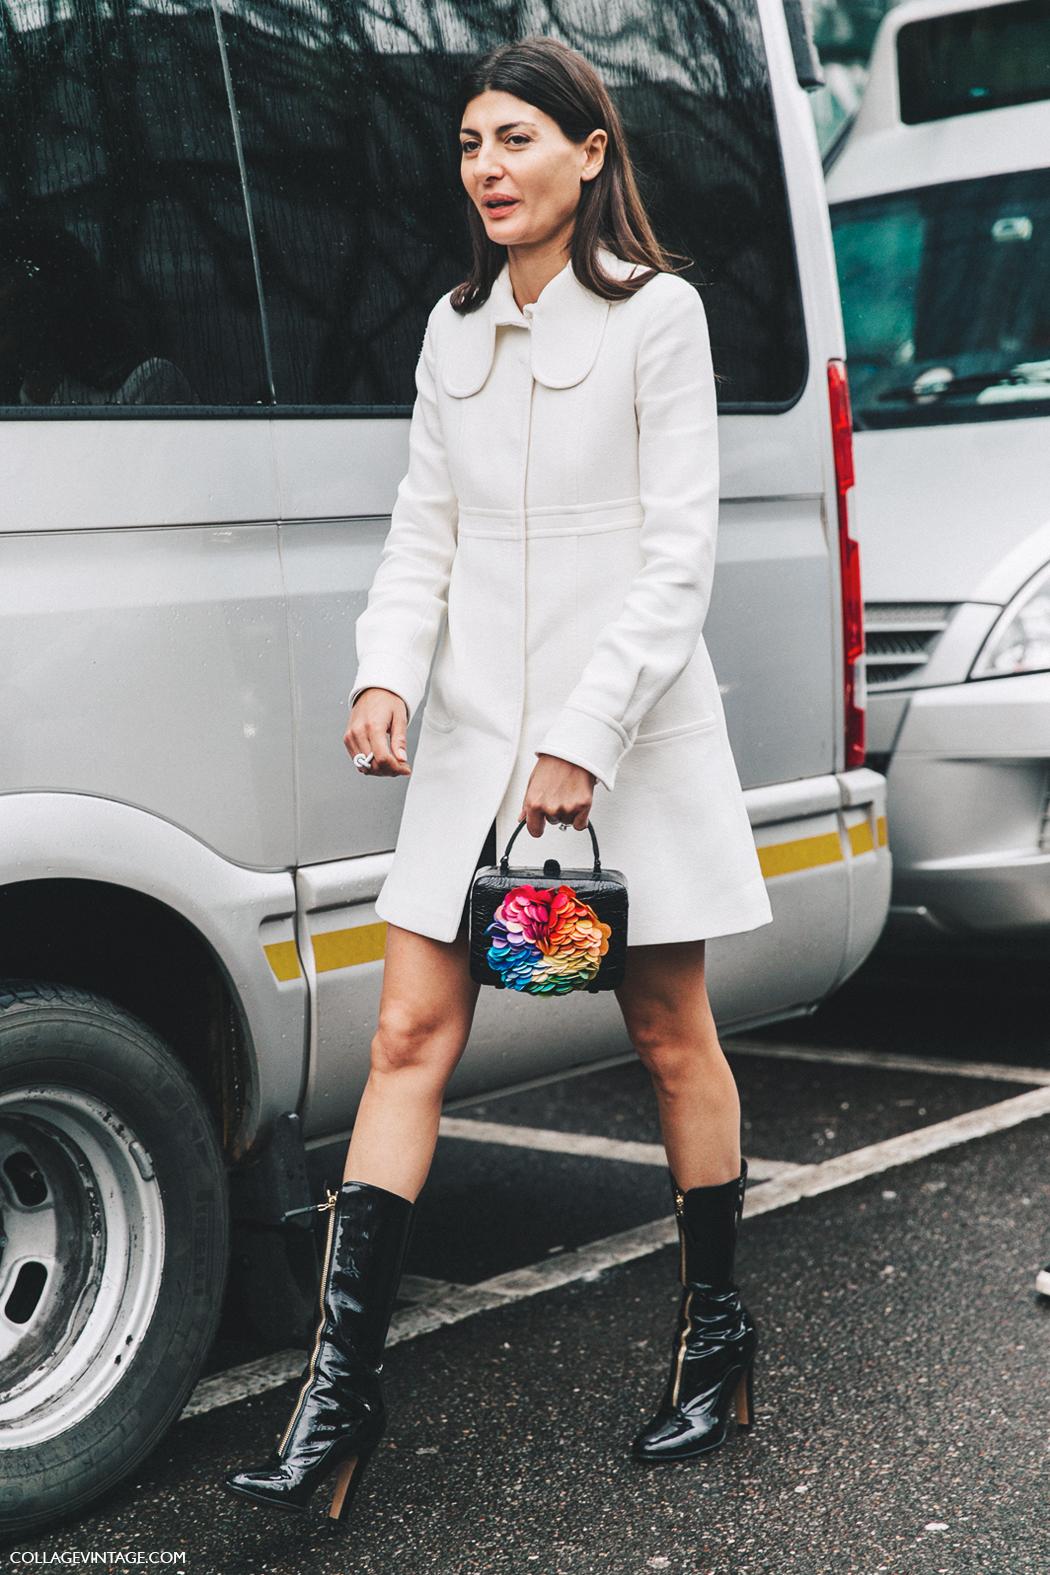 Milan_Fashion_Week_Fall_16-MFW-Street_Style-Collage_Vintage-Giovanna_Battaglia-Zipper_Boots-White_Coat-1